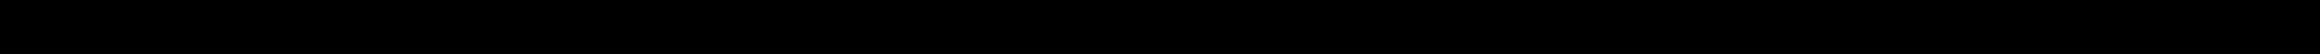 TOPRAN 04F 145 049A, 04L 906 051C, 04L 906 051K, 04F 145 049A, 04L 906 051C Sensor, ladetryk